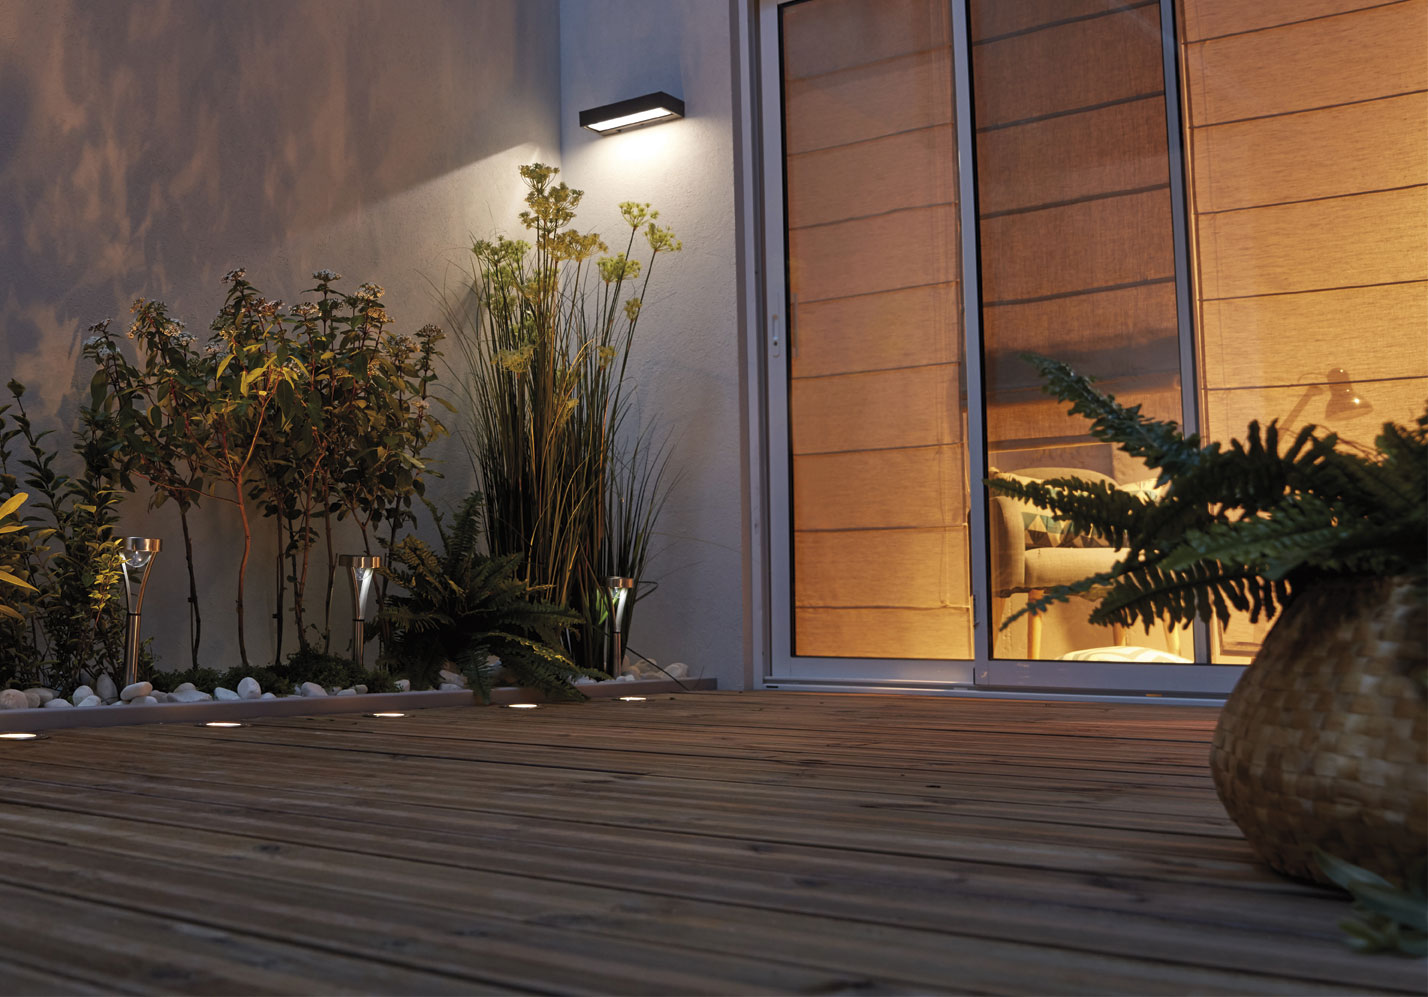 C mo elegir l mparas solares para iluminar el exterior for Iluminacion solar de jardin